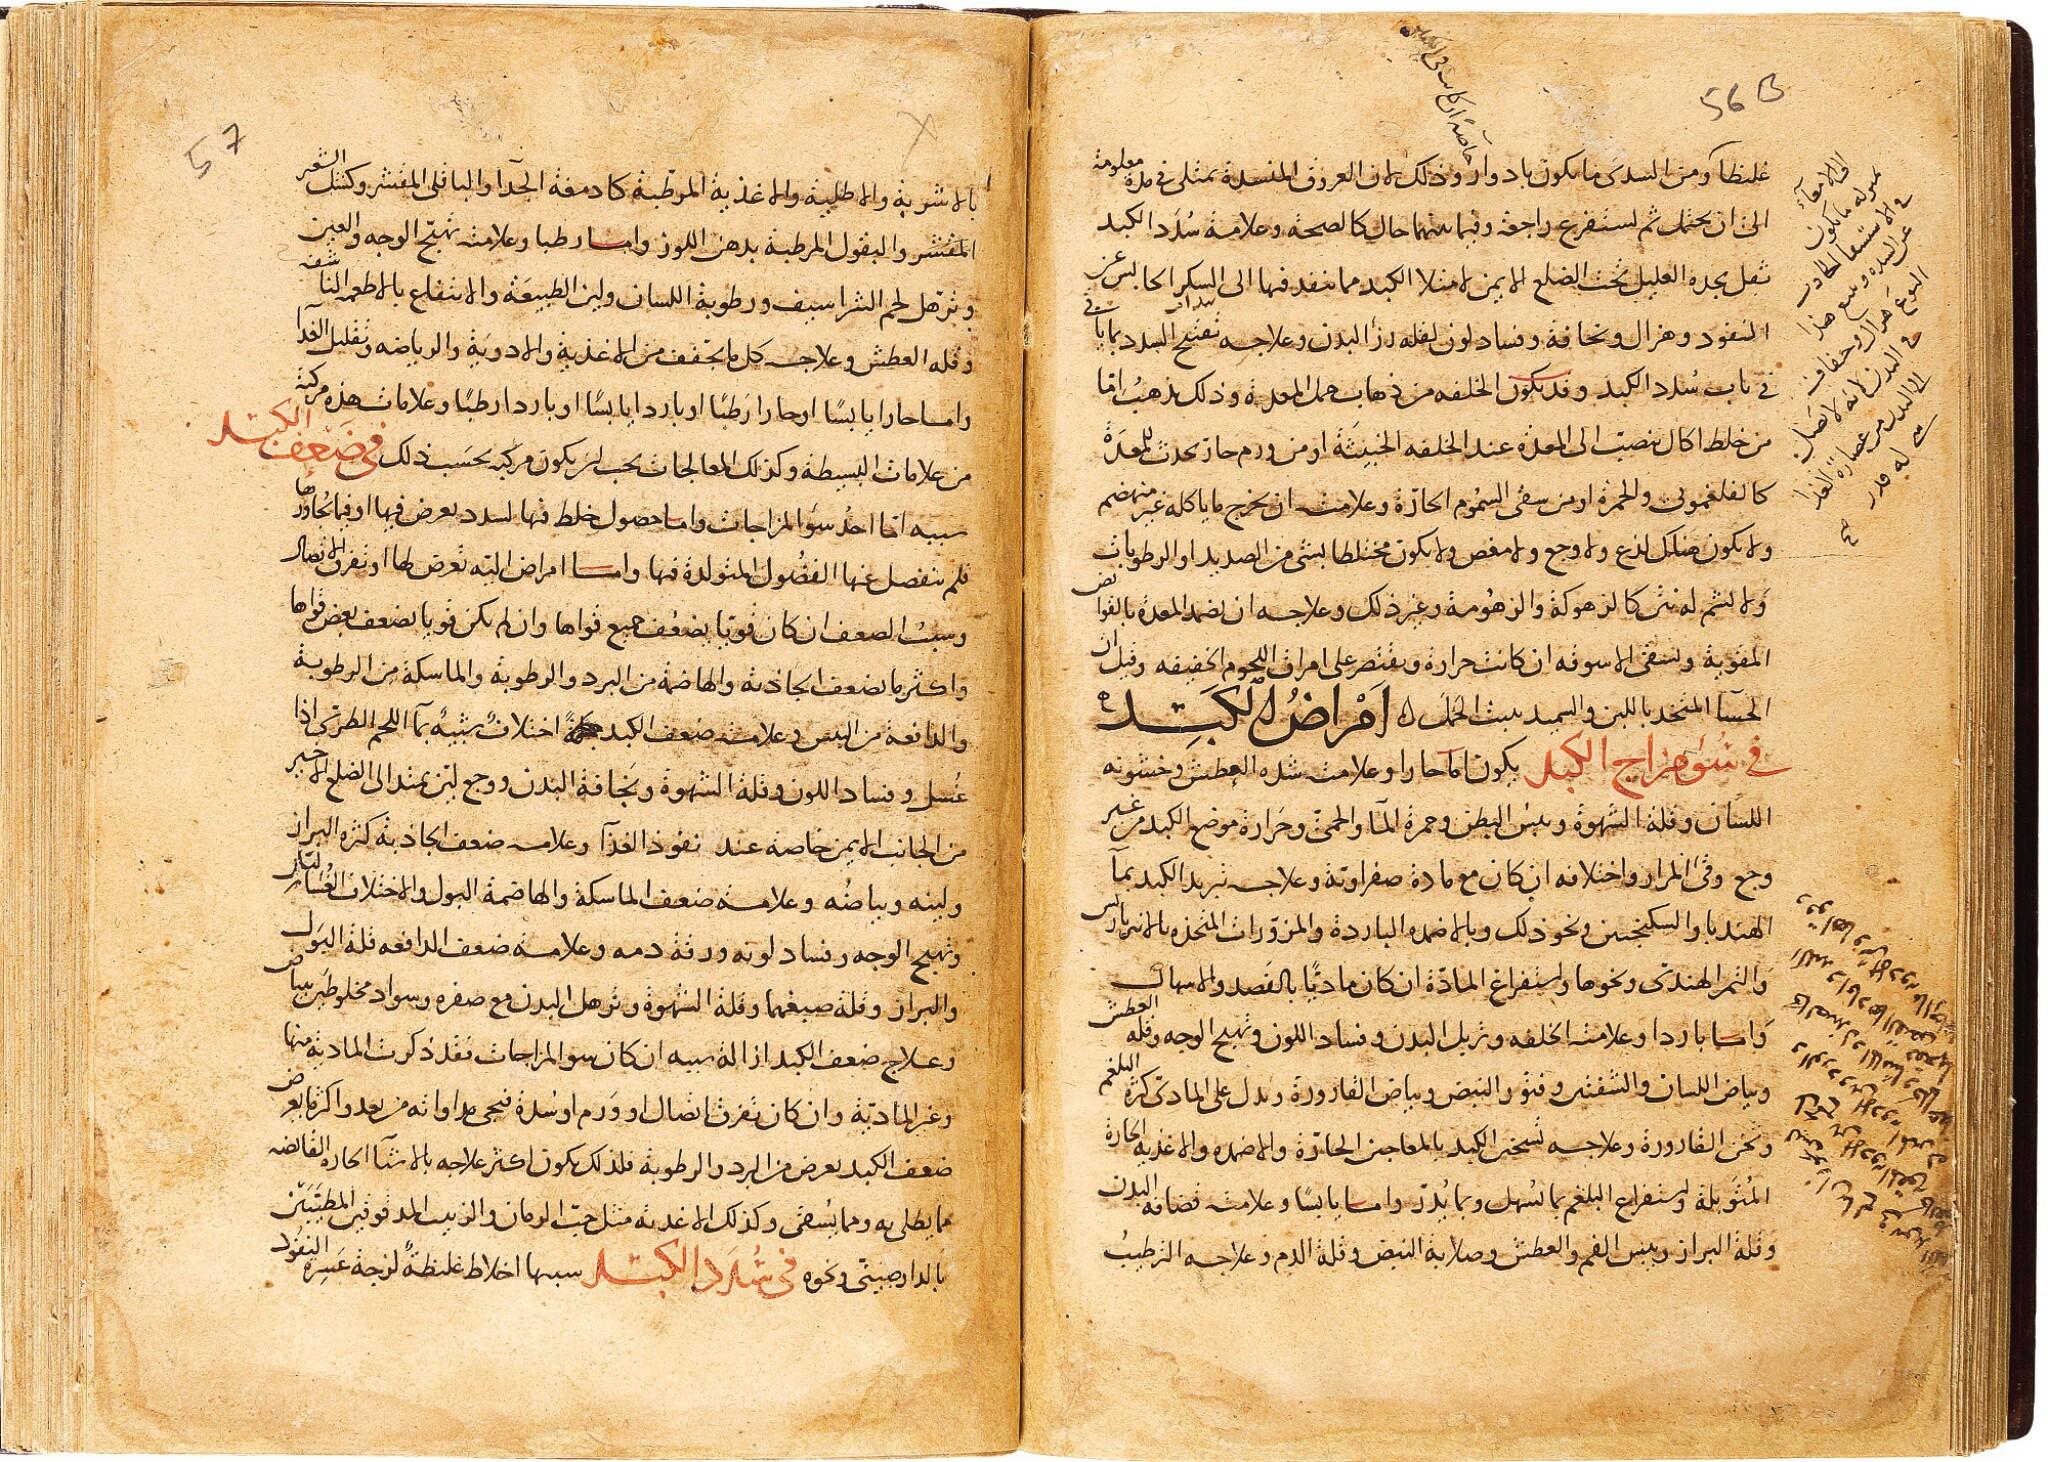 View full screen - View 1 of Lot 115. NAJIB AL-DIN AL-SAMARQANDI (D.1222 AD), KITAB AL-ASBAB WA'AL-'ALAMAT ('THE CAUSES OF ILLNESSES AND THEIR SYMPTOMS AND THEIR TREATMENTS') COPIED BY MUHAMMED B. ABI BAKIR AL-NISHAPURI, CENTRAL ASIA, DATED 594 AH/1197 AD.